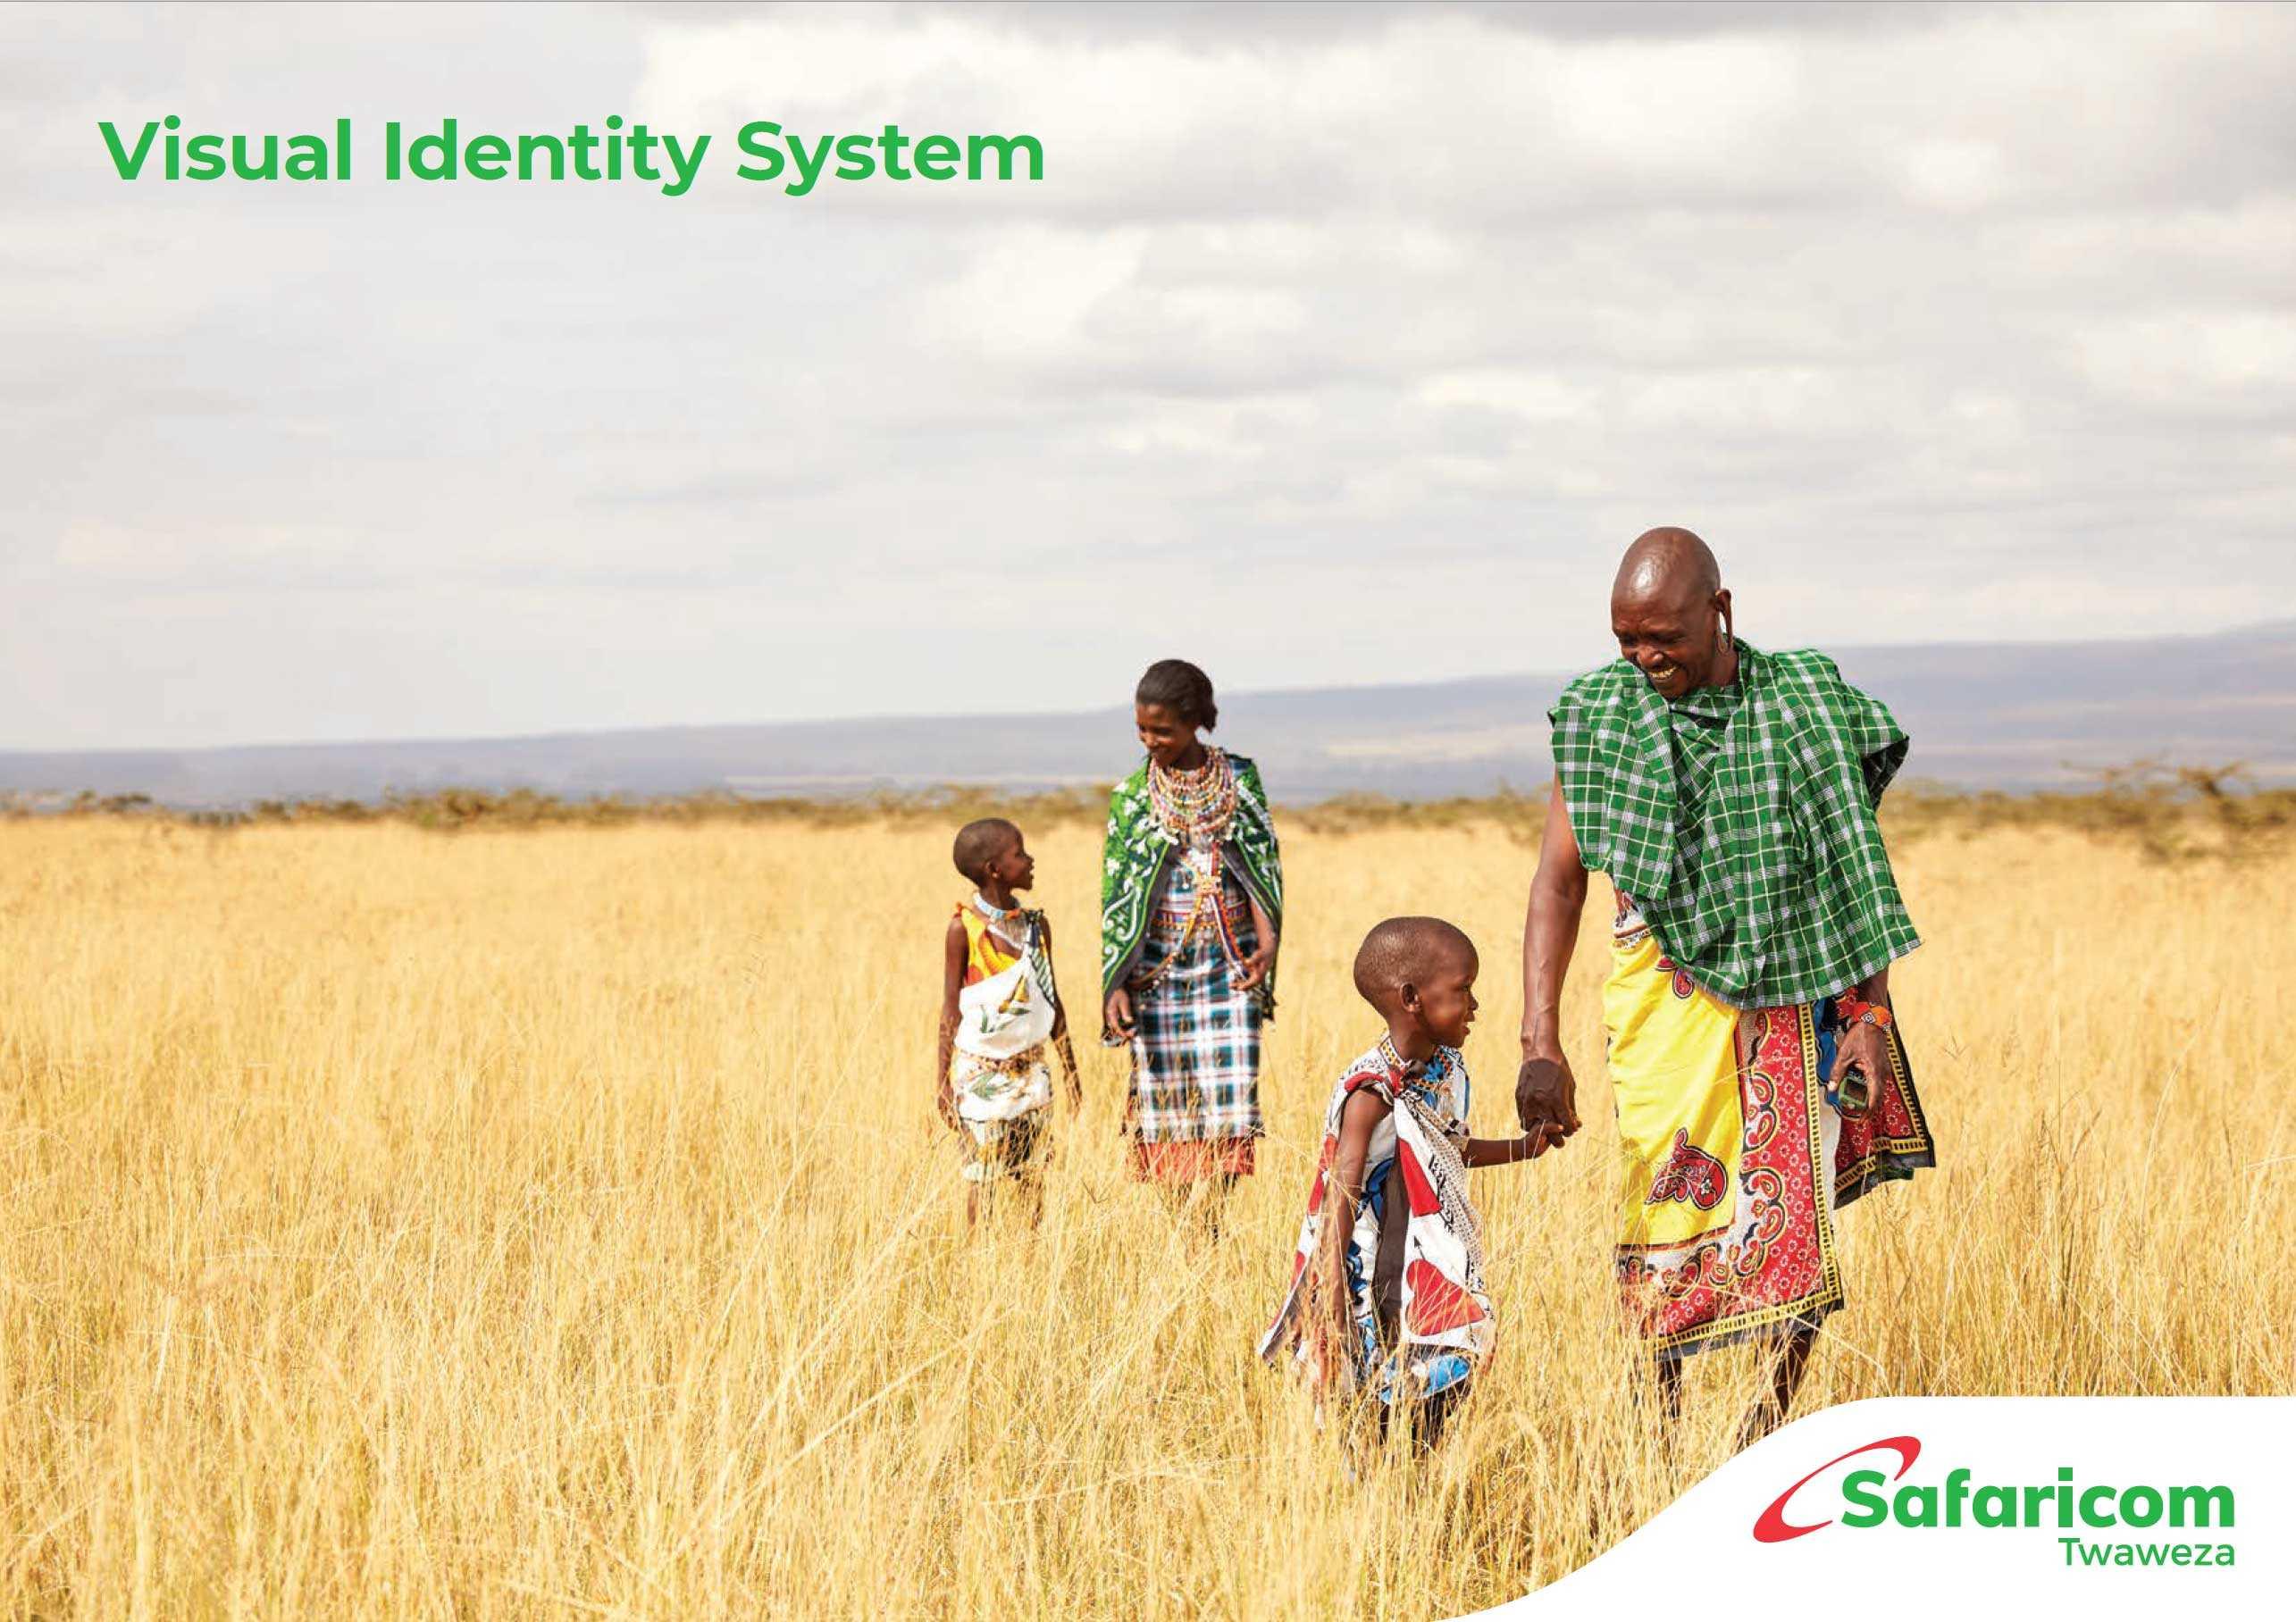 Safaricom-Brand-Guidelines